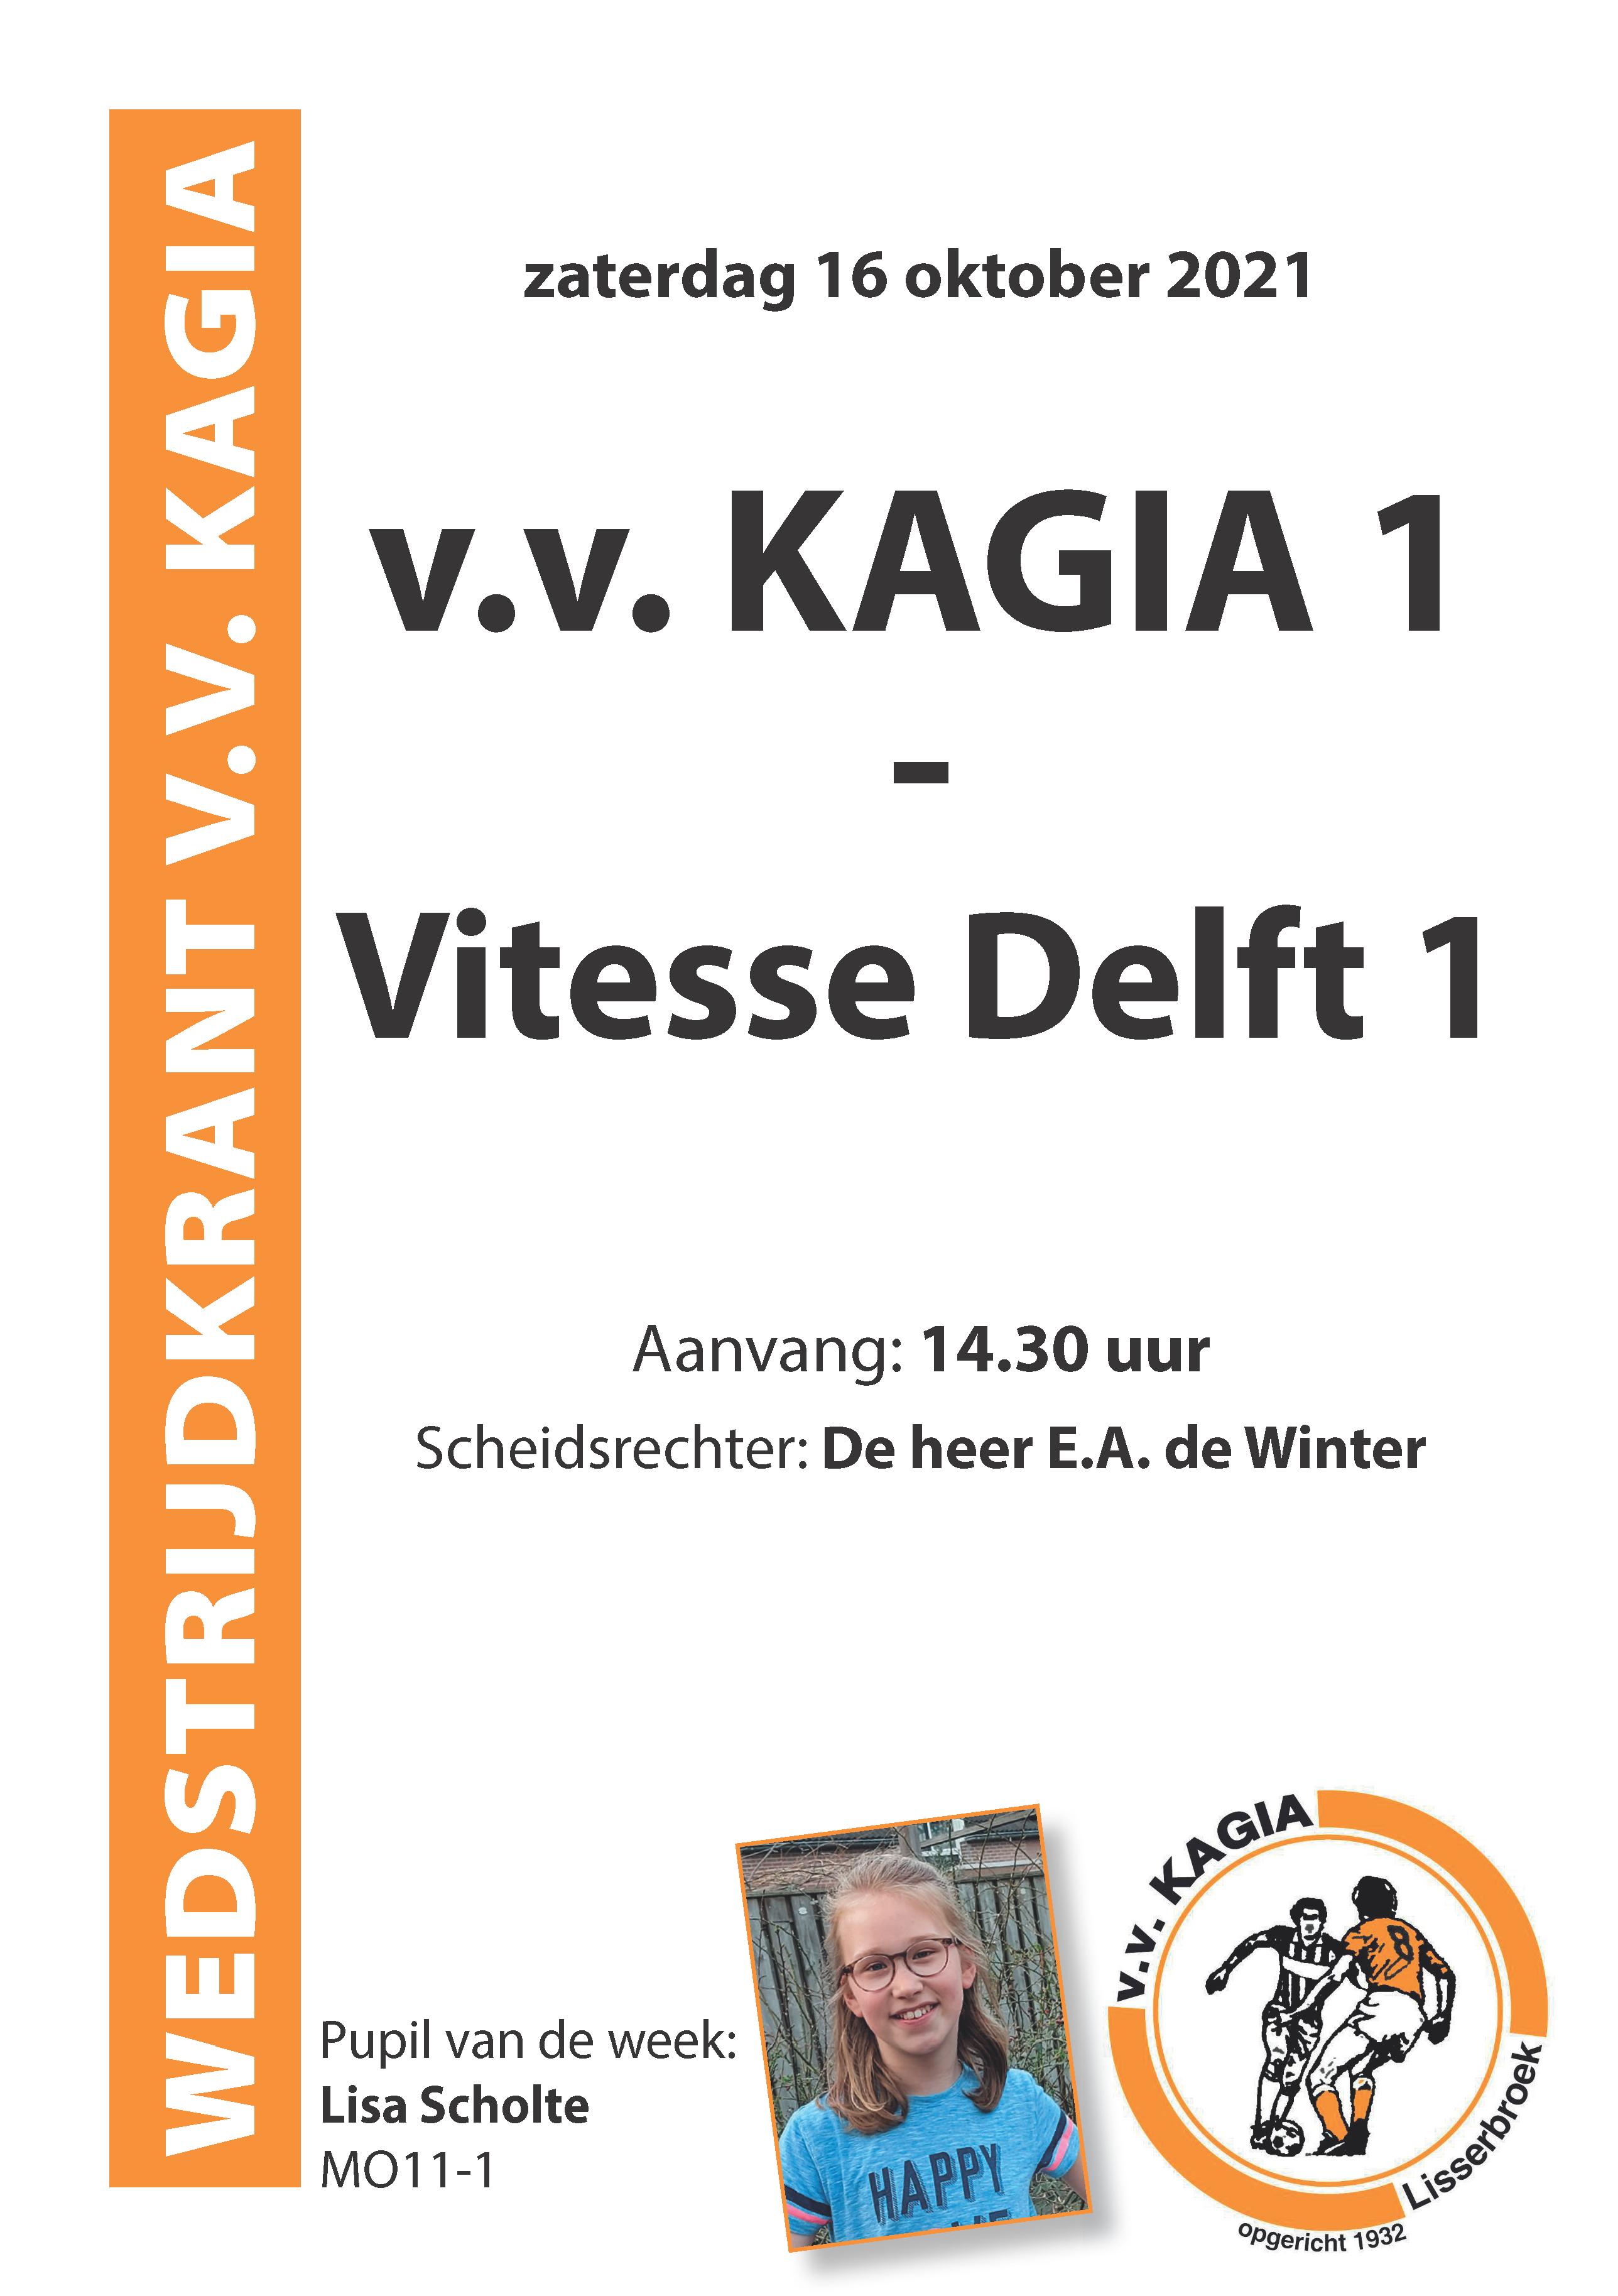 Wedstrijdkrantje | Kagia - Vitesse Delft